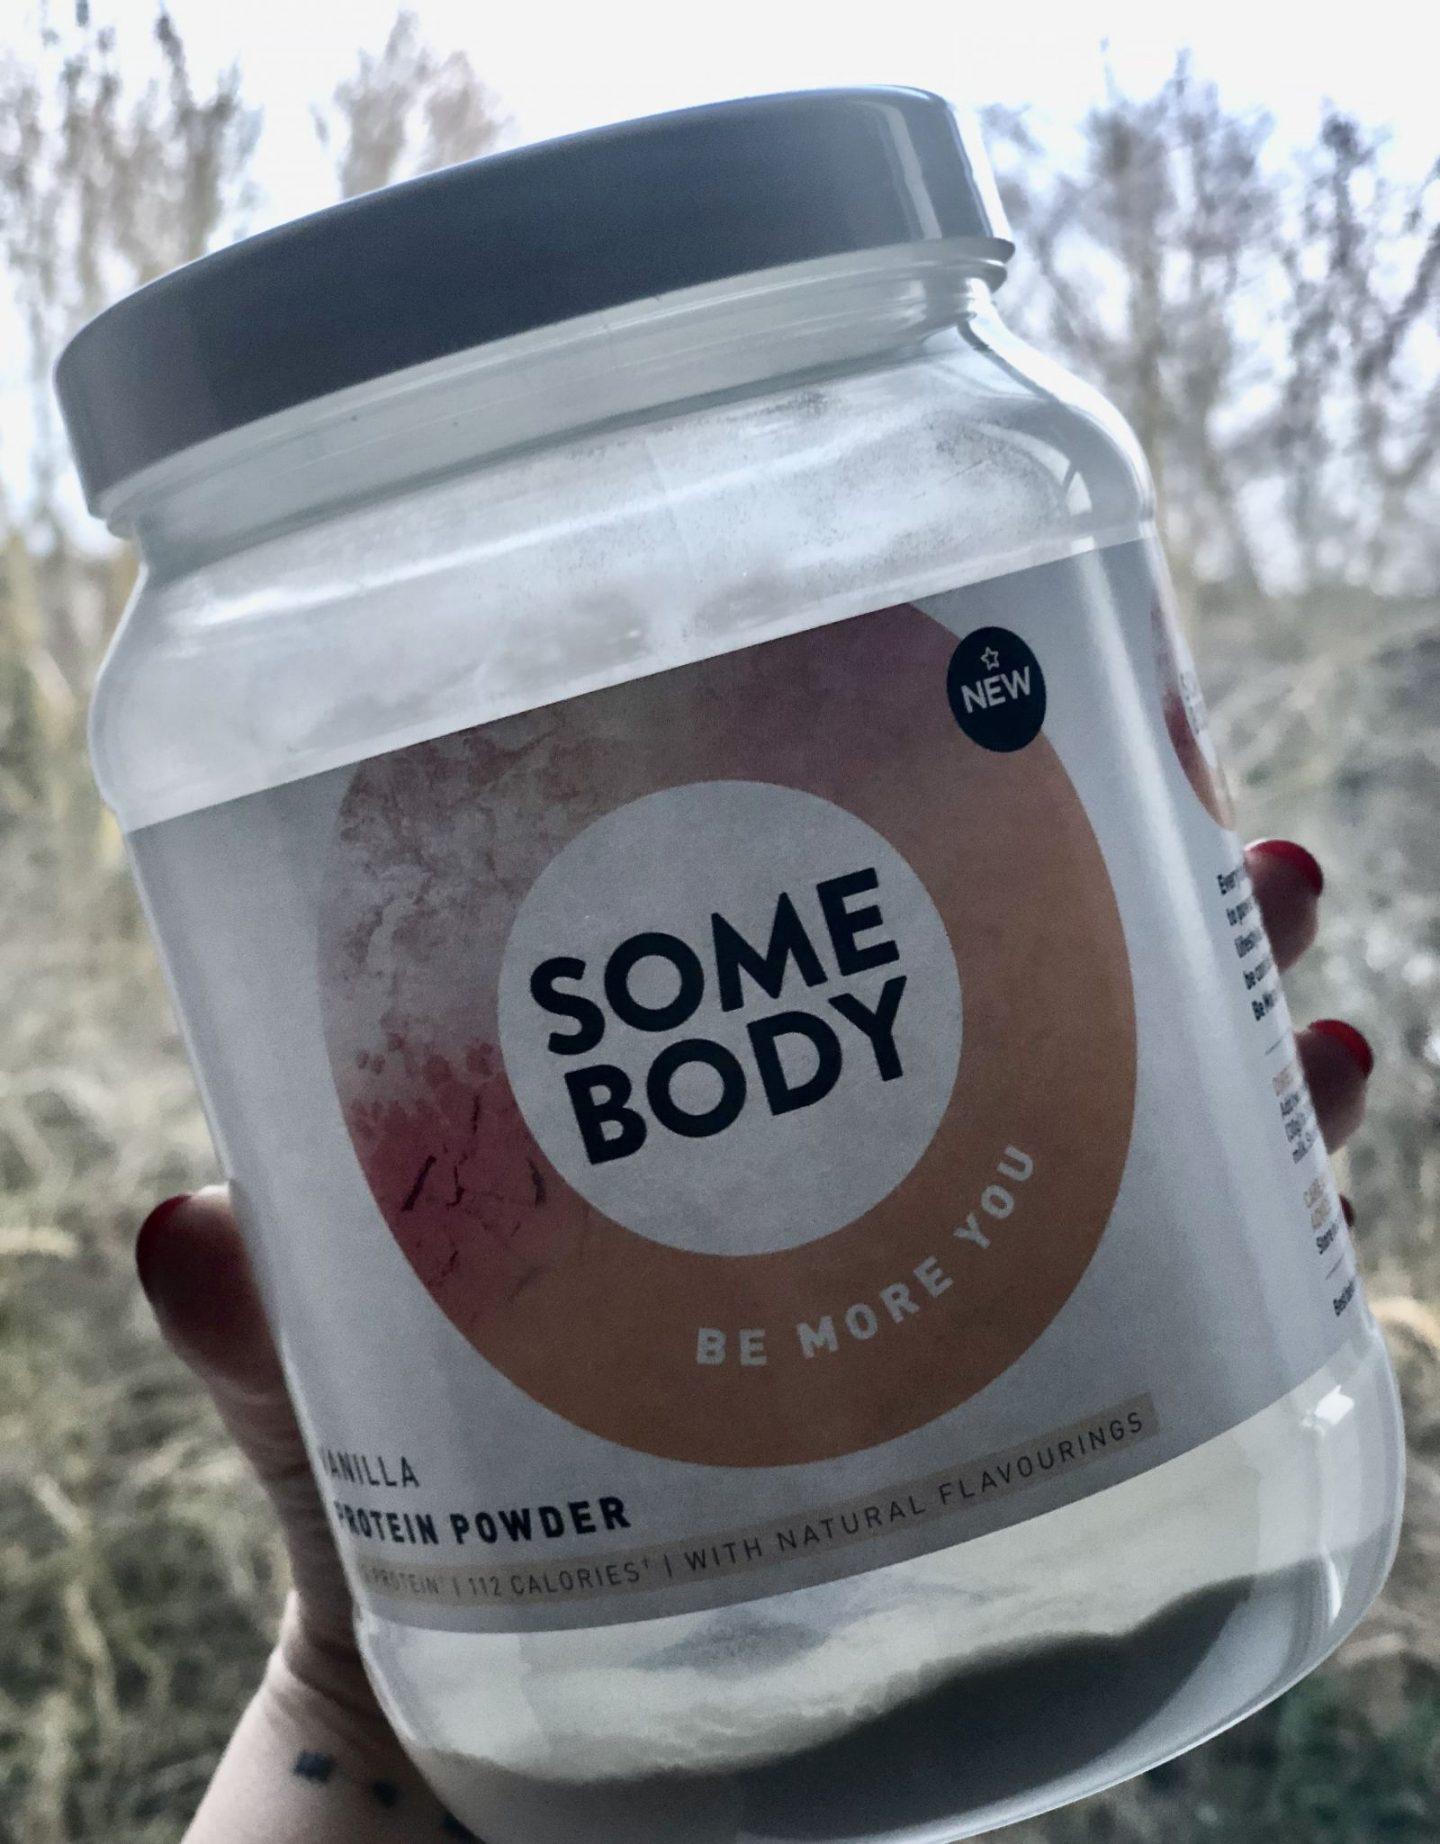 Some Body Protein Powder